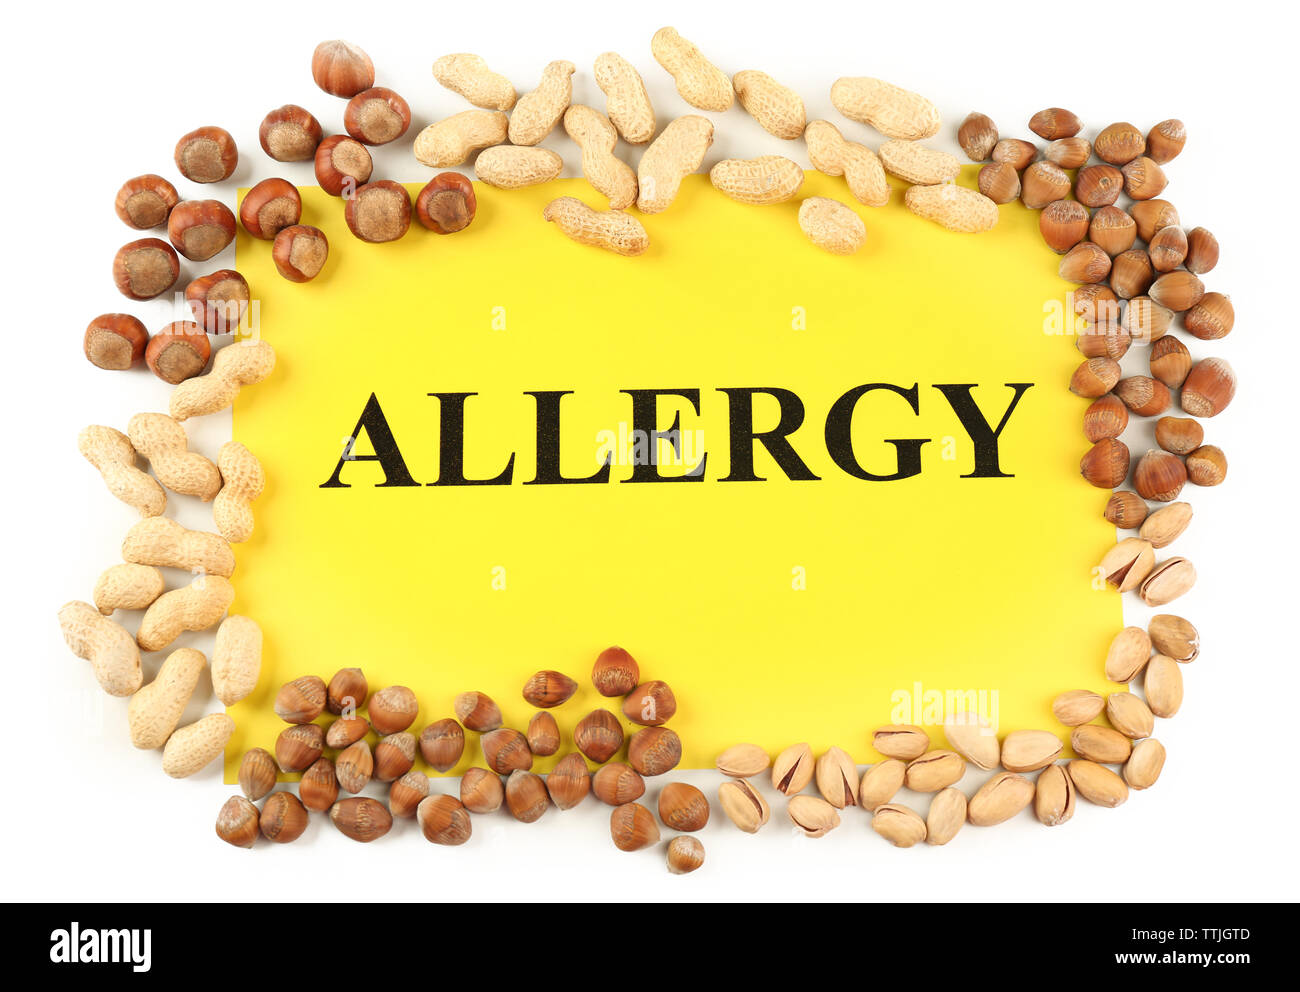 Nut allergy - Stock Image